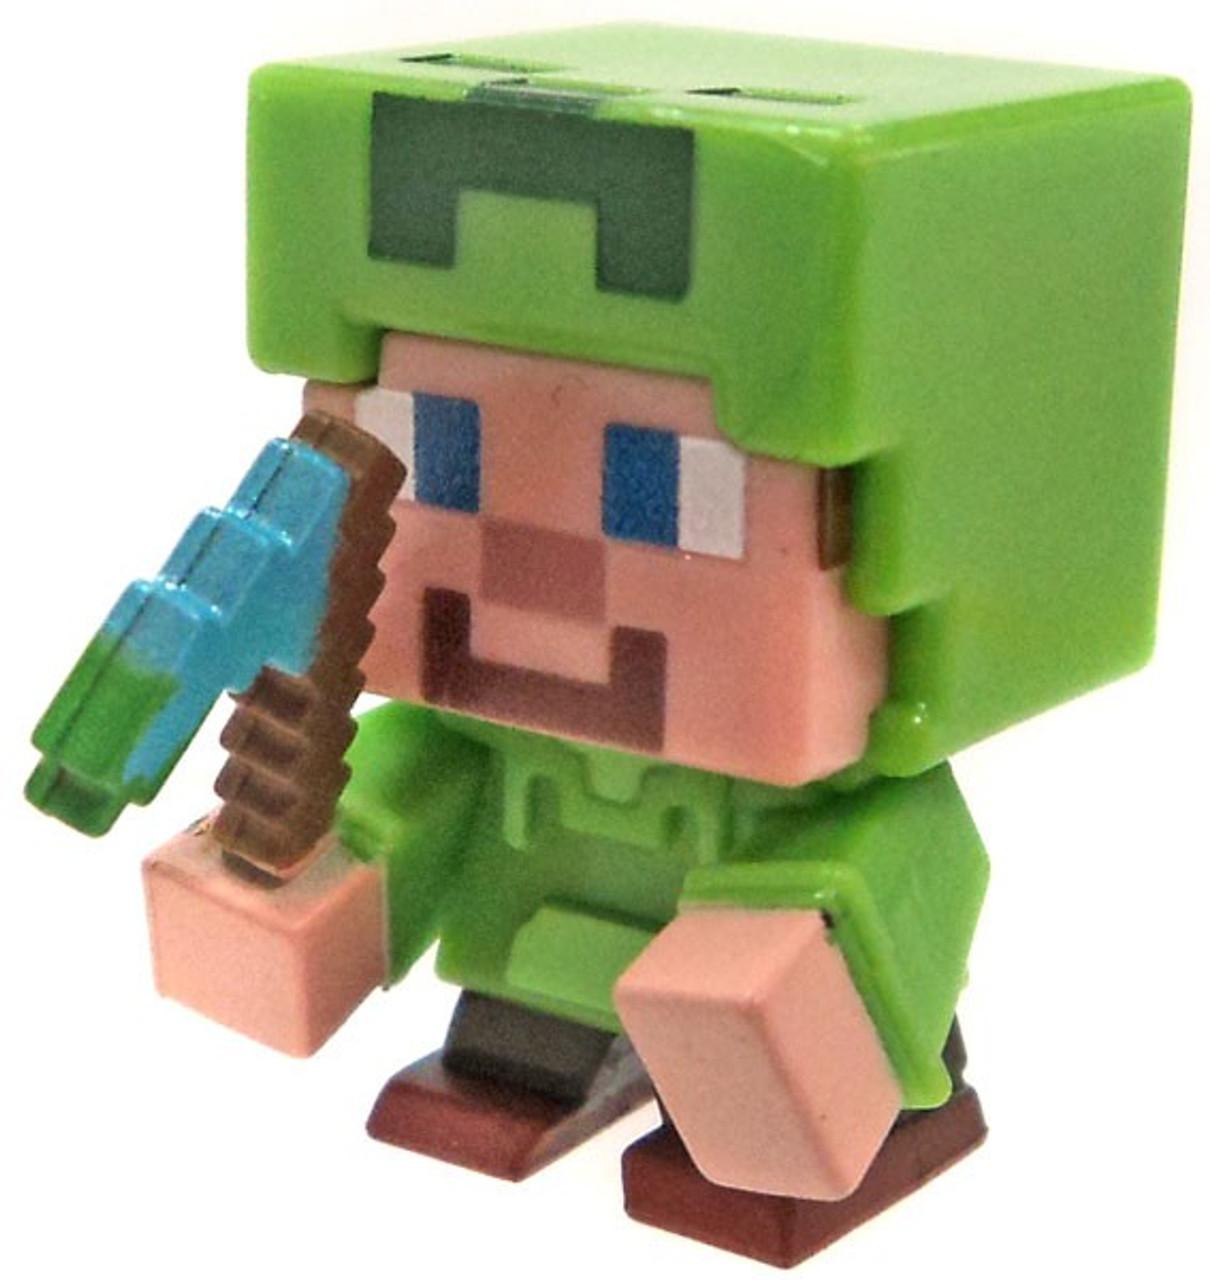 Minecraft spooky halloween series 9 steve in creeper hoodie mystery minifigure loose mattel toys - Minecraft creeper and steve ...